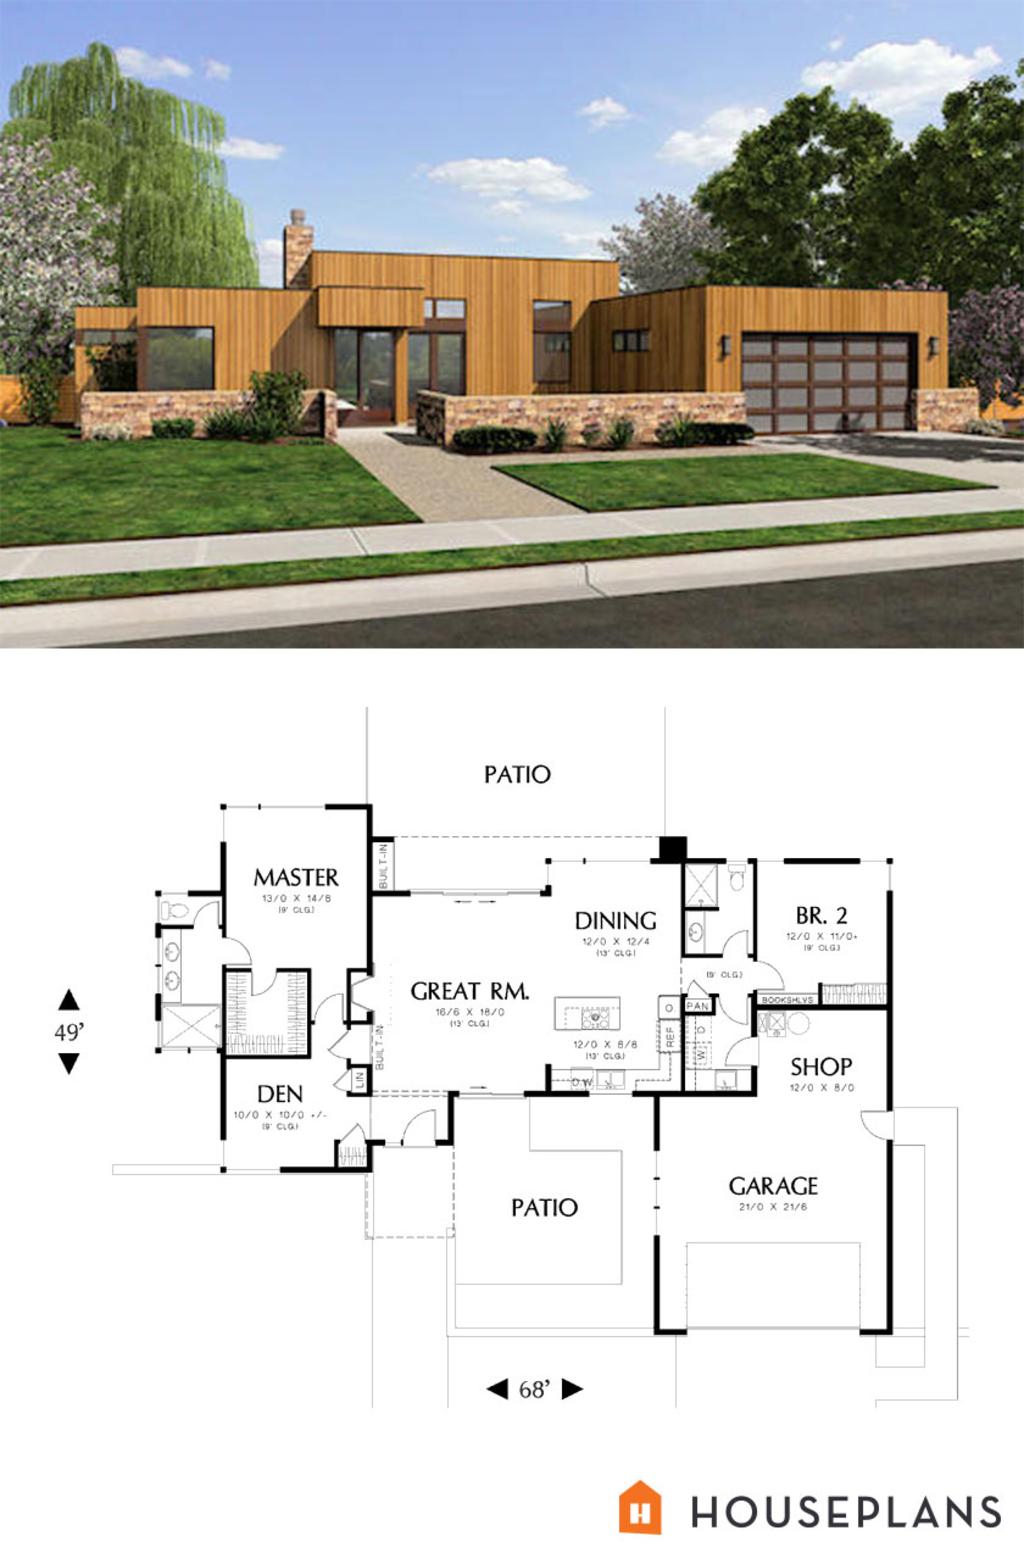 Modern Style House Plan 2 Beds 2 Baths 1508 Sq Ft Plan 48 505